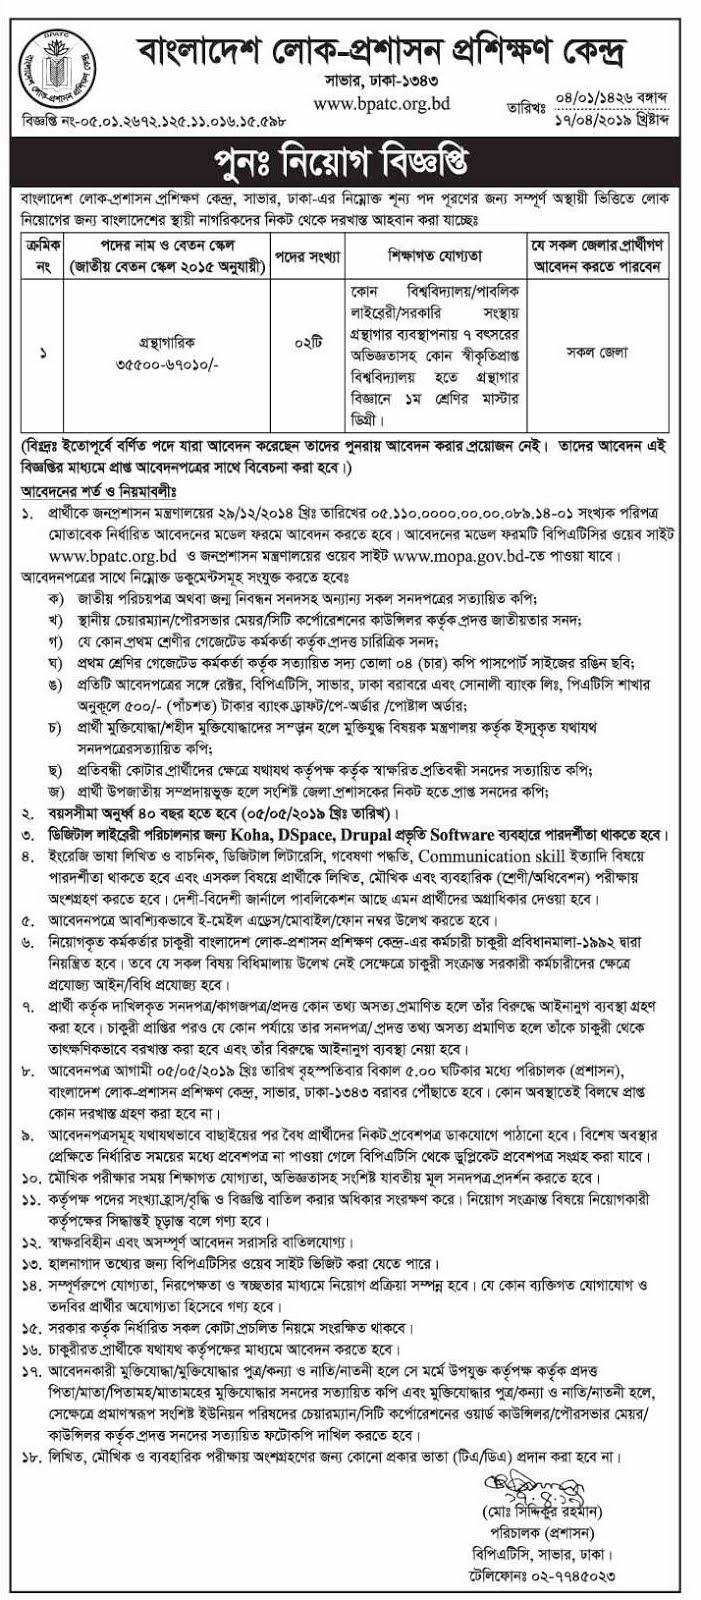 Bangladesh Public Administration Training Centre (BPATC) job circular